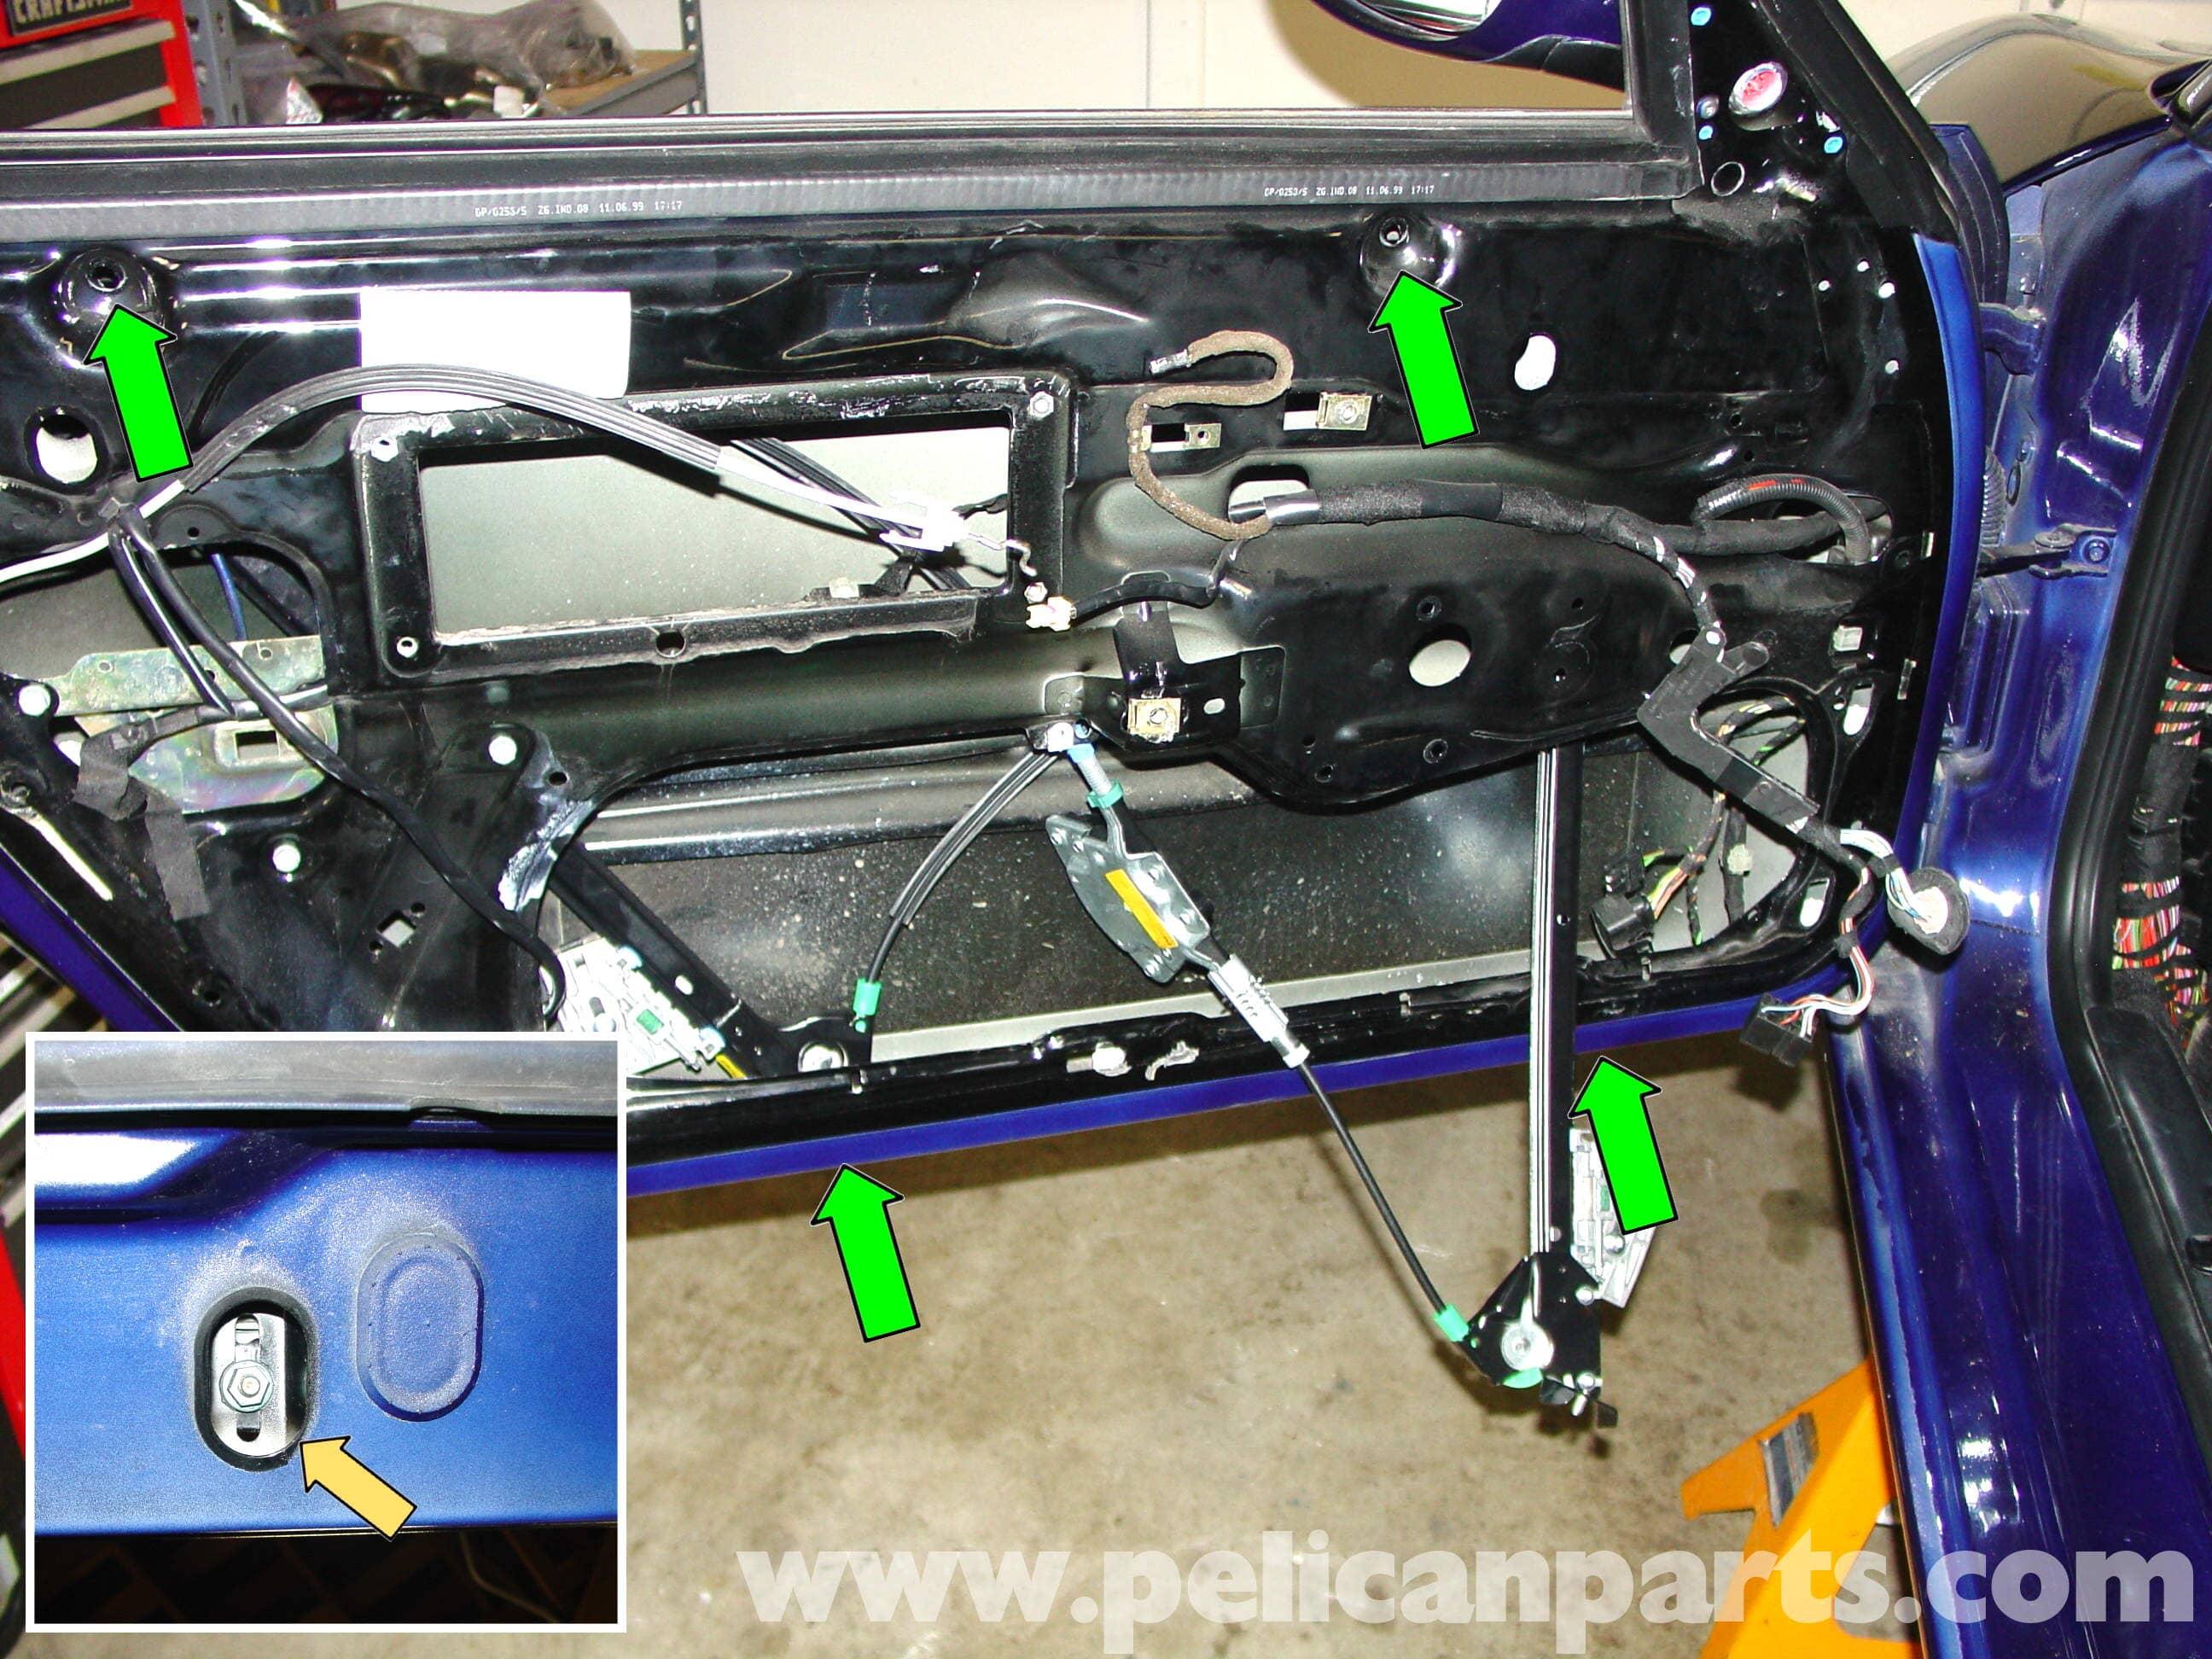 push pull switch wiring diagram 05 pontiac g6 stereo porsche 911 carrera window regulator and motor replacement - 996 (1998-2005) 997 (2005-2012 ...